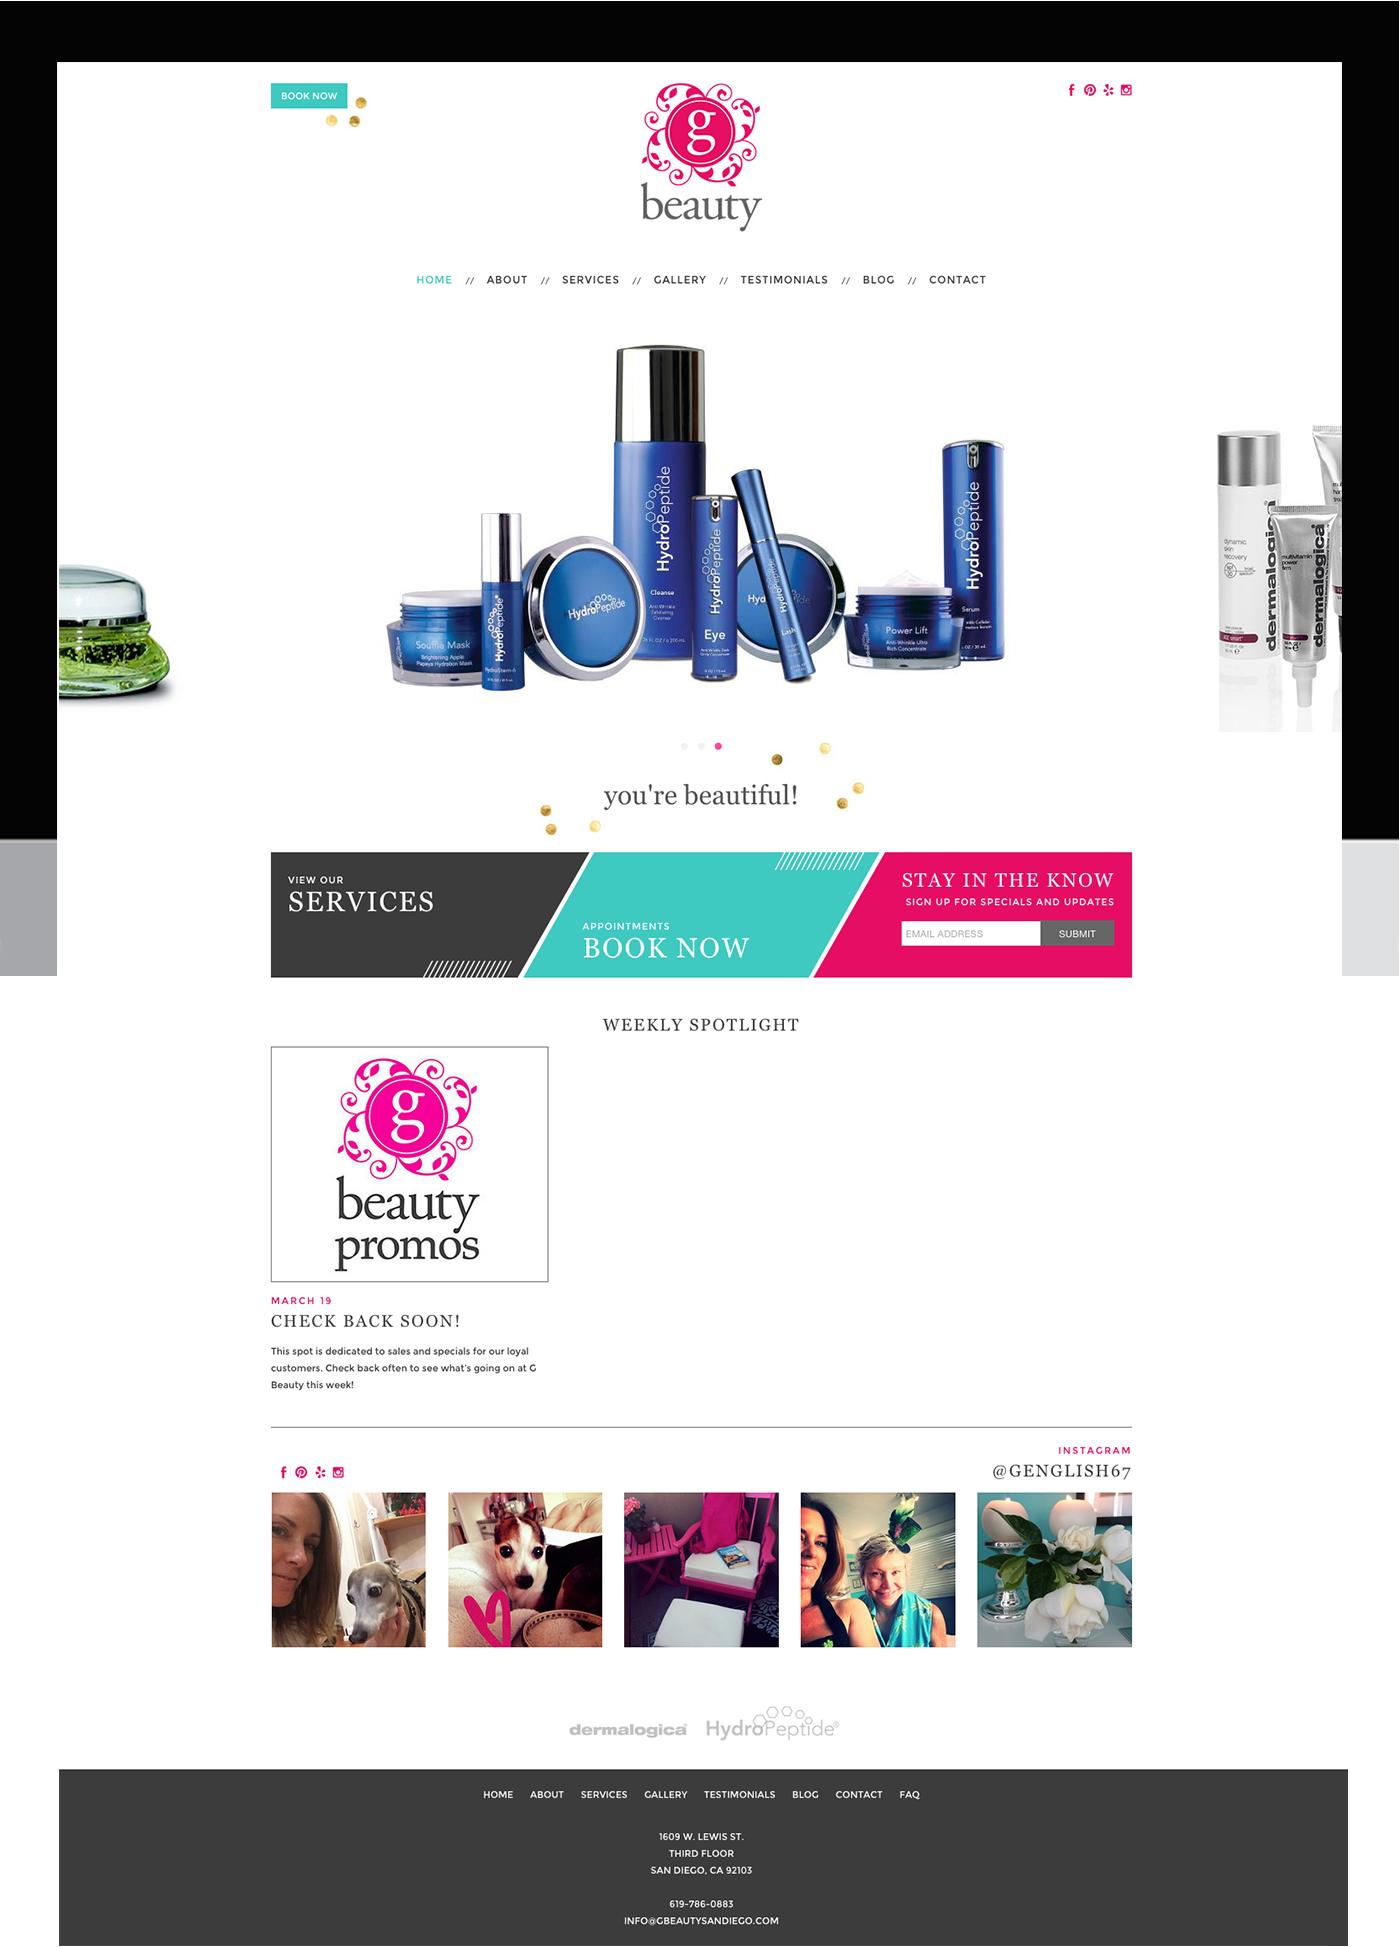 Wordpress blog and website for G Beauty Skincare. #wordpress gbeautysandiego.com